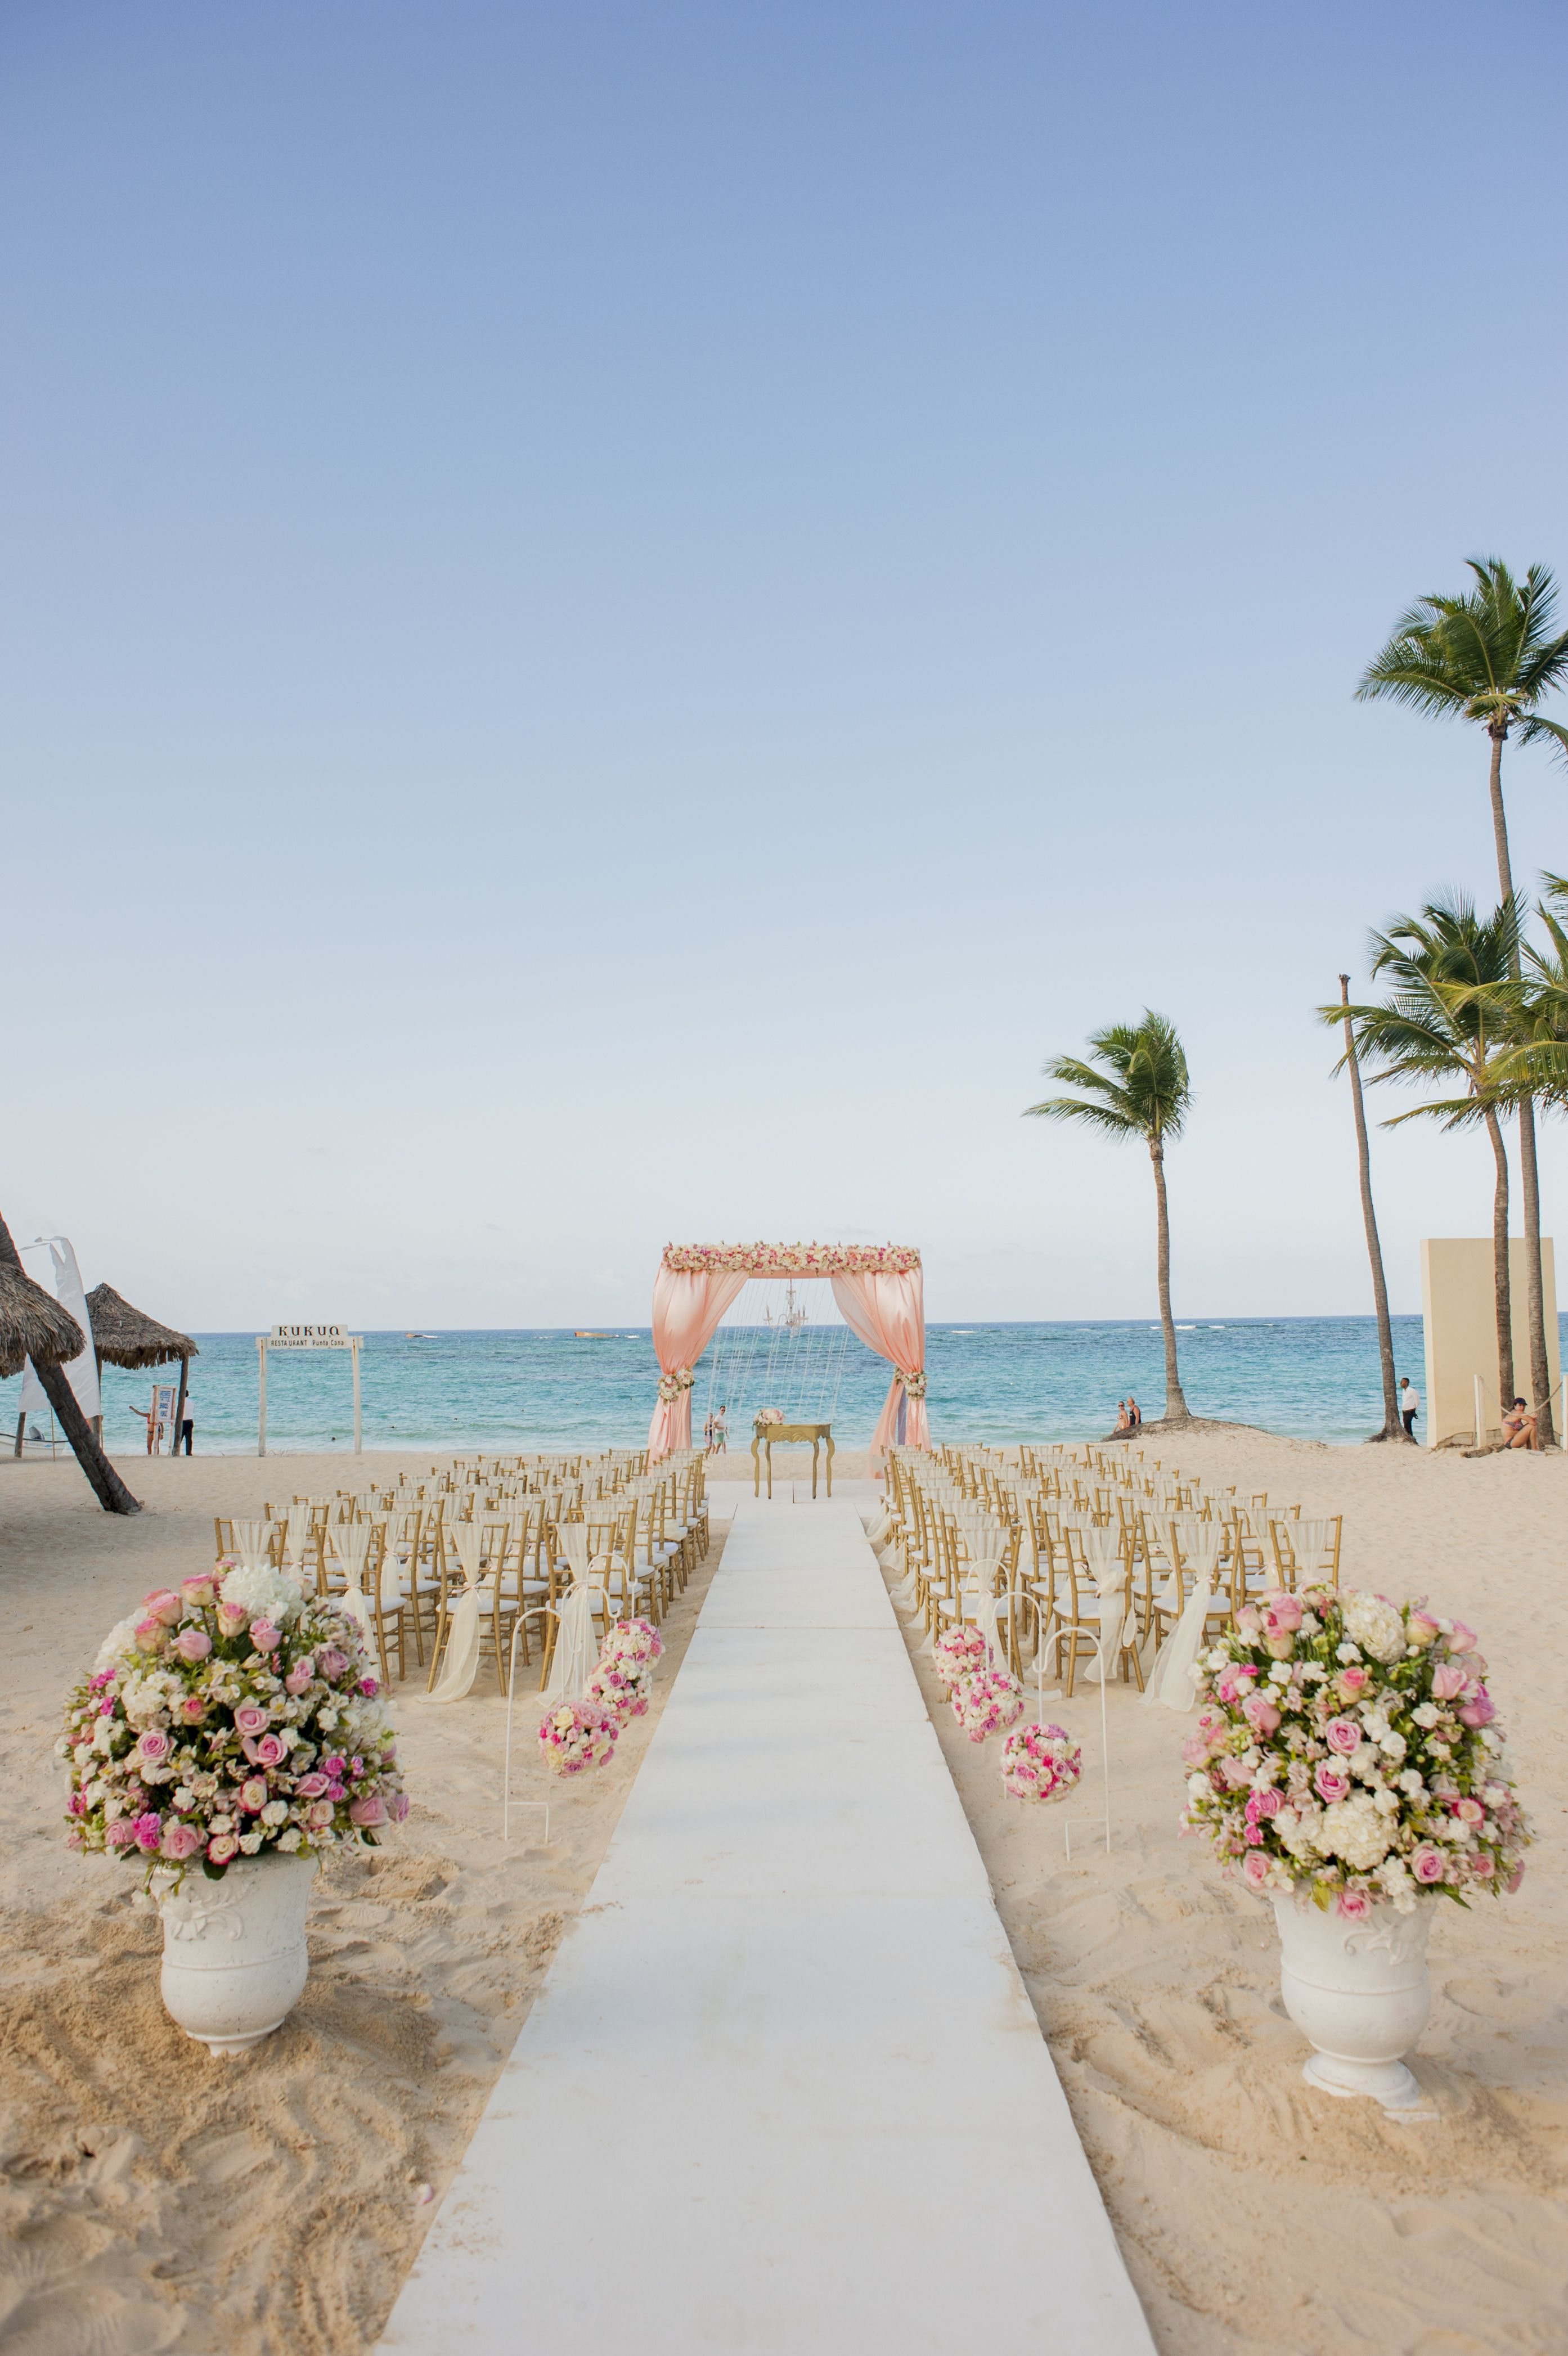 Pink Floral Gazebo Romantic Beach Wedding Venue Kukua Punta Cana